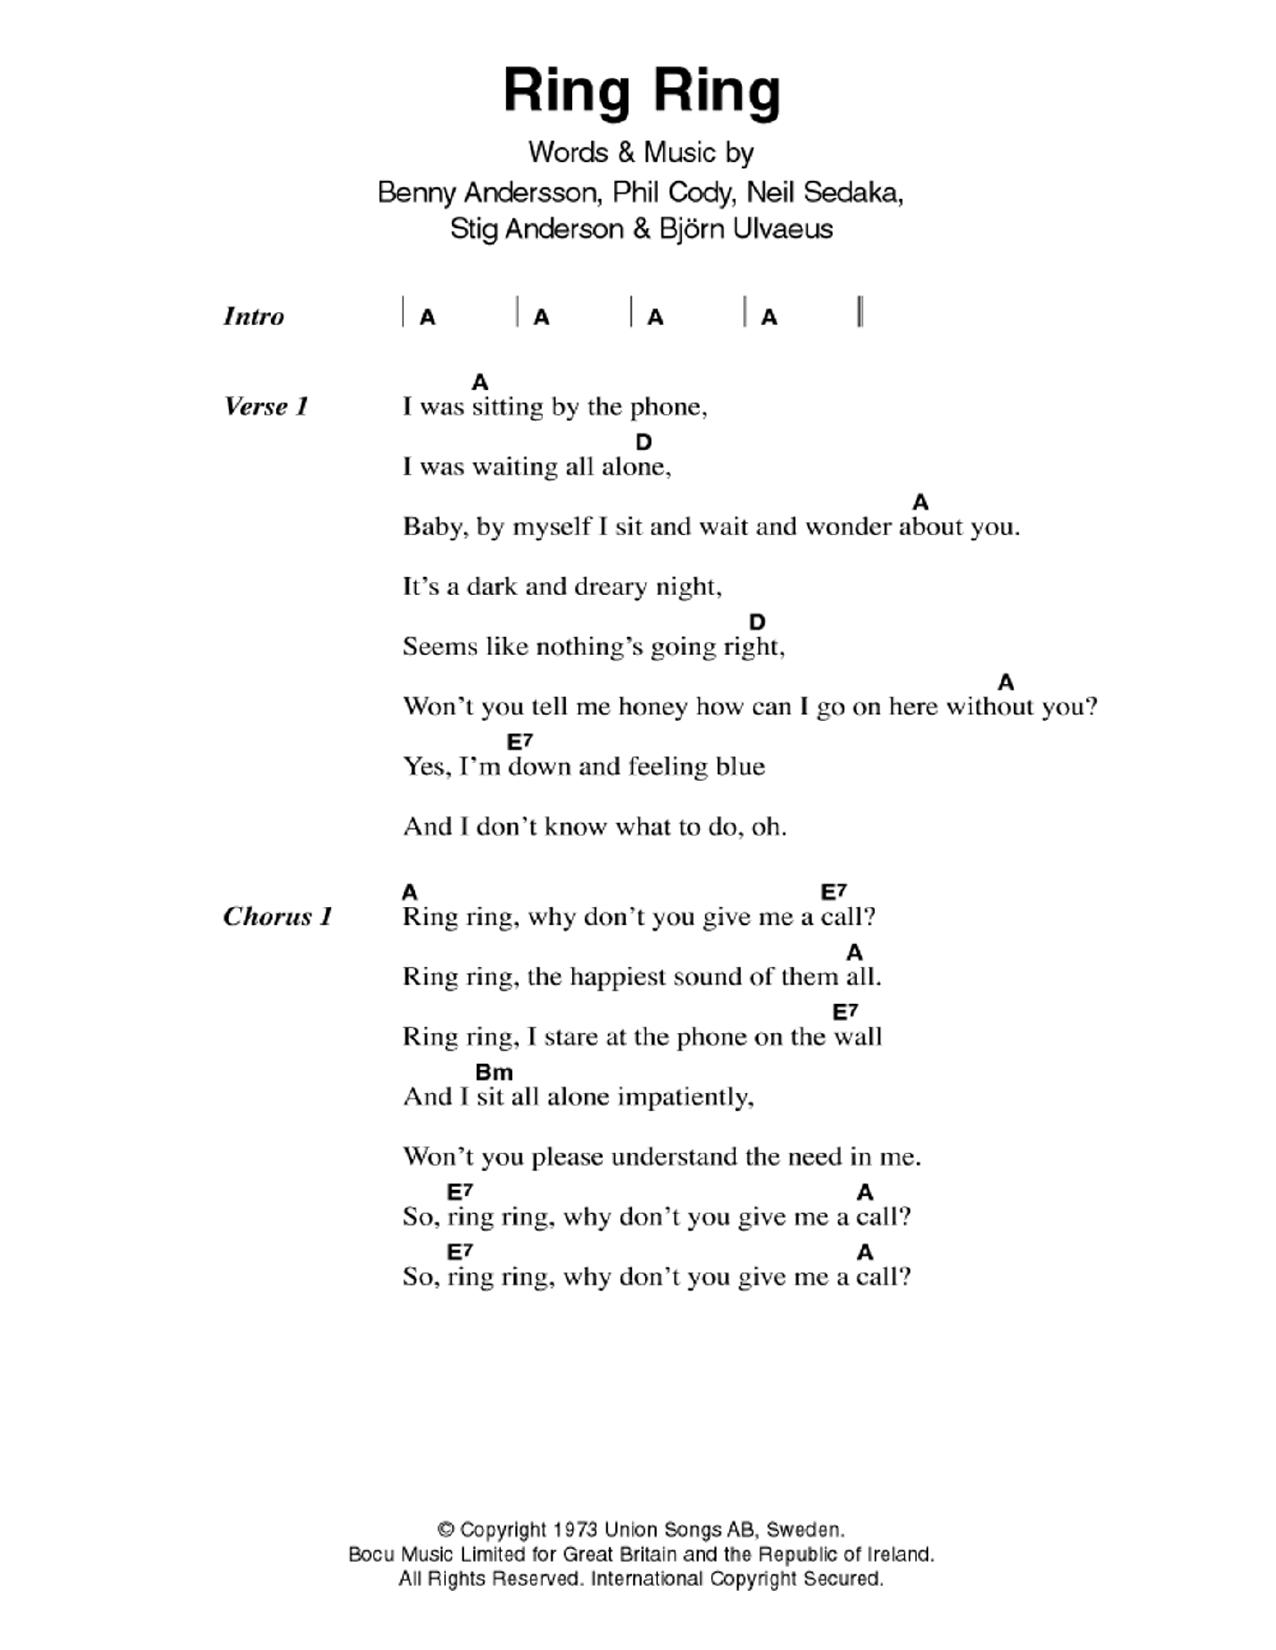 Bing Crosby White Christmas Sheet Music